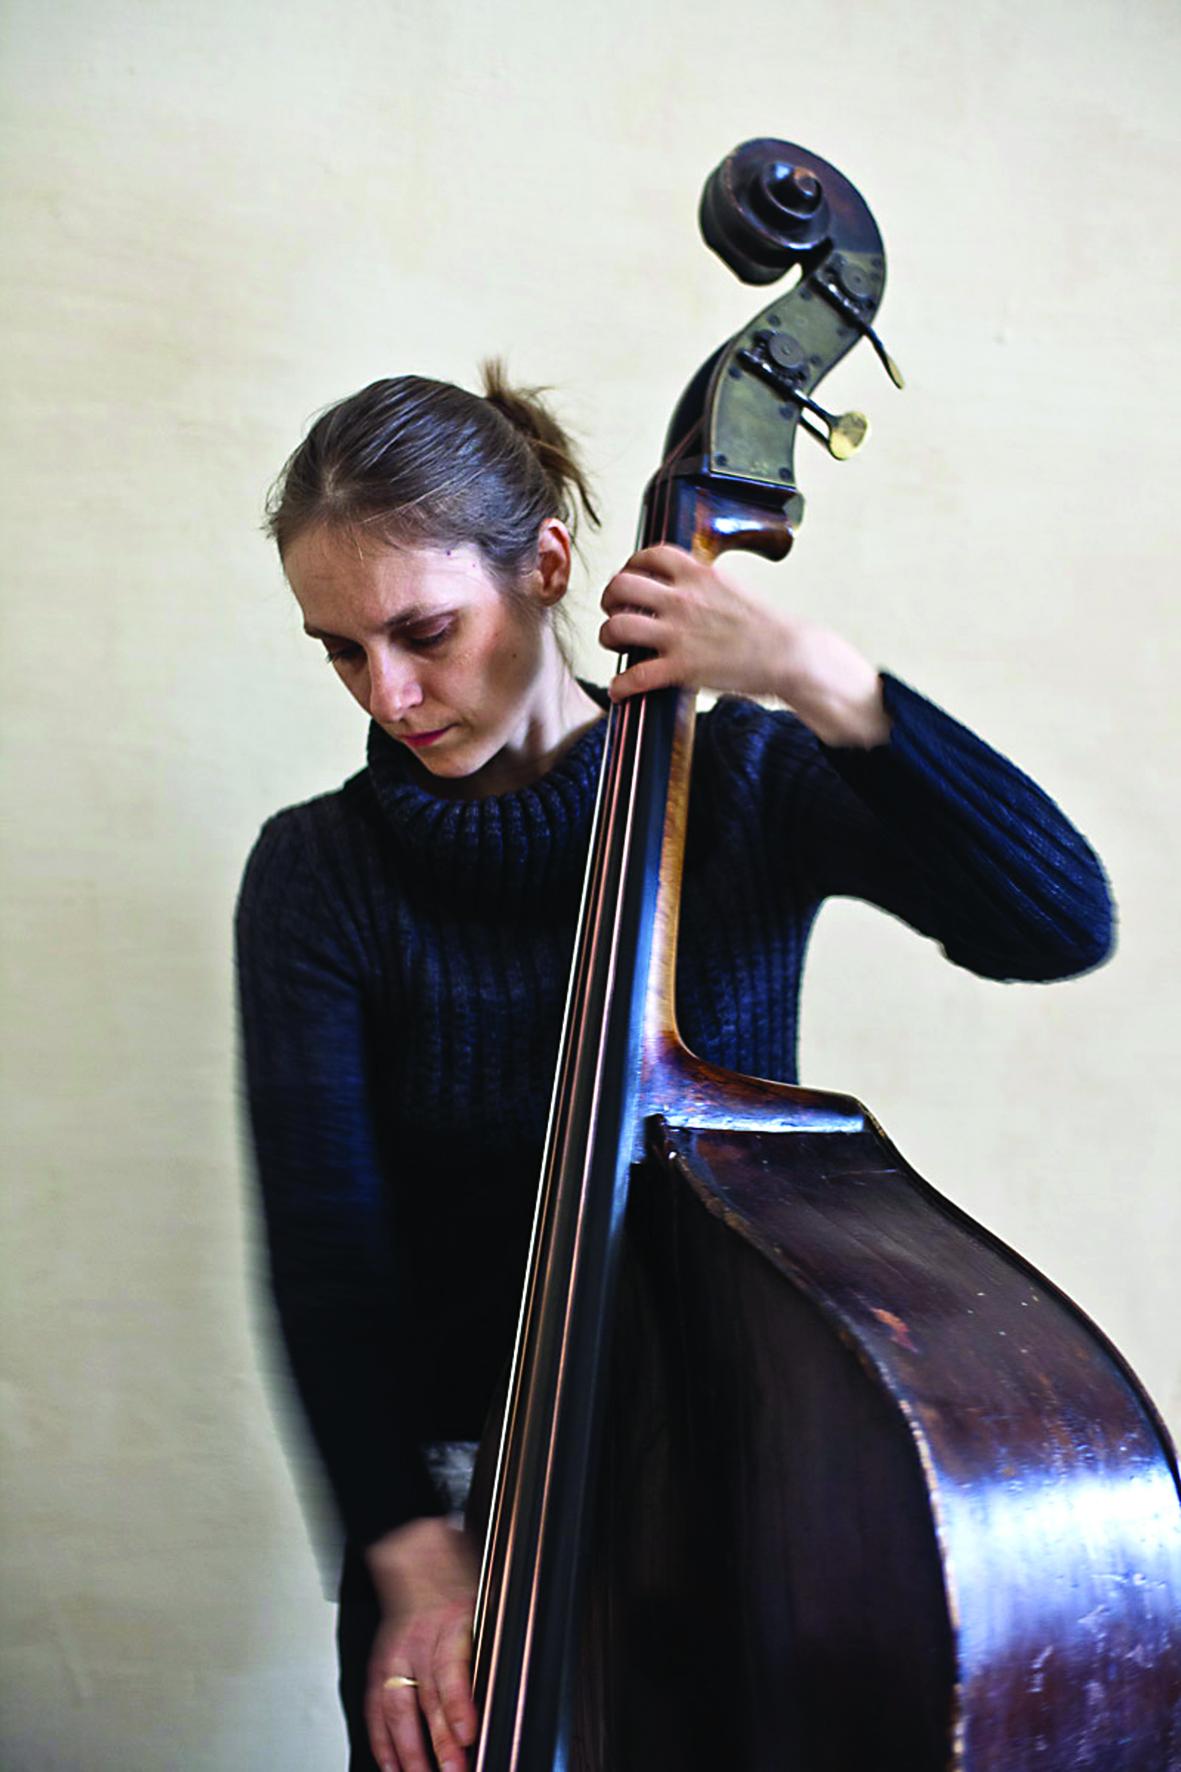 Anne Mette Iversen